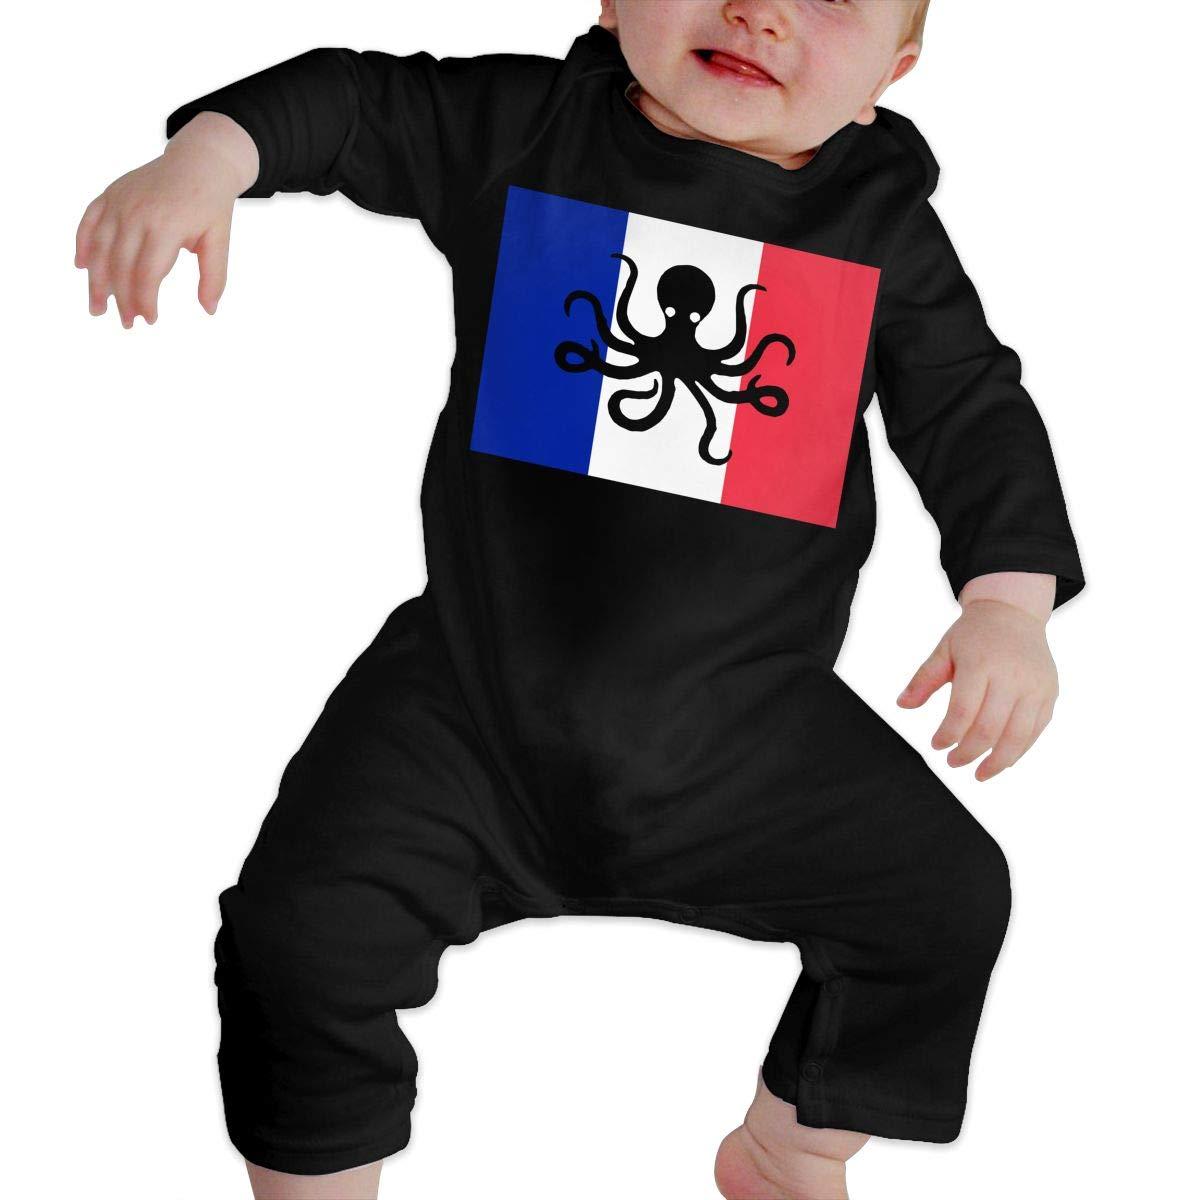 YUE--3BODY Octopus France Flag Newborn Baby Long Sleeve Baby Newborn Boy Superman Bodysuits Onesies